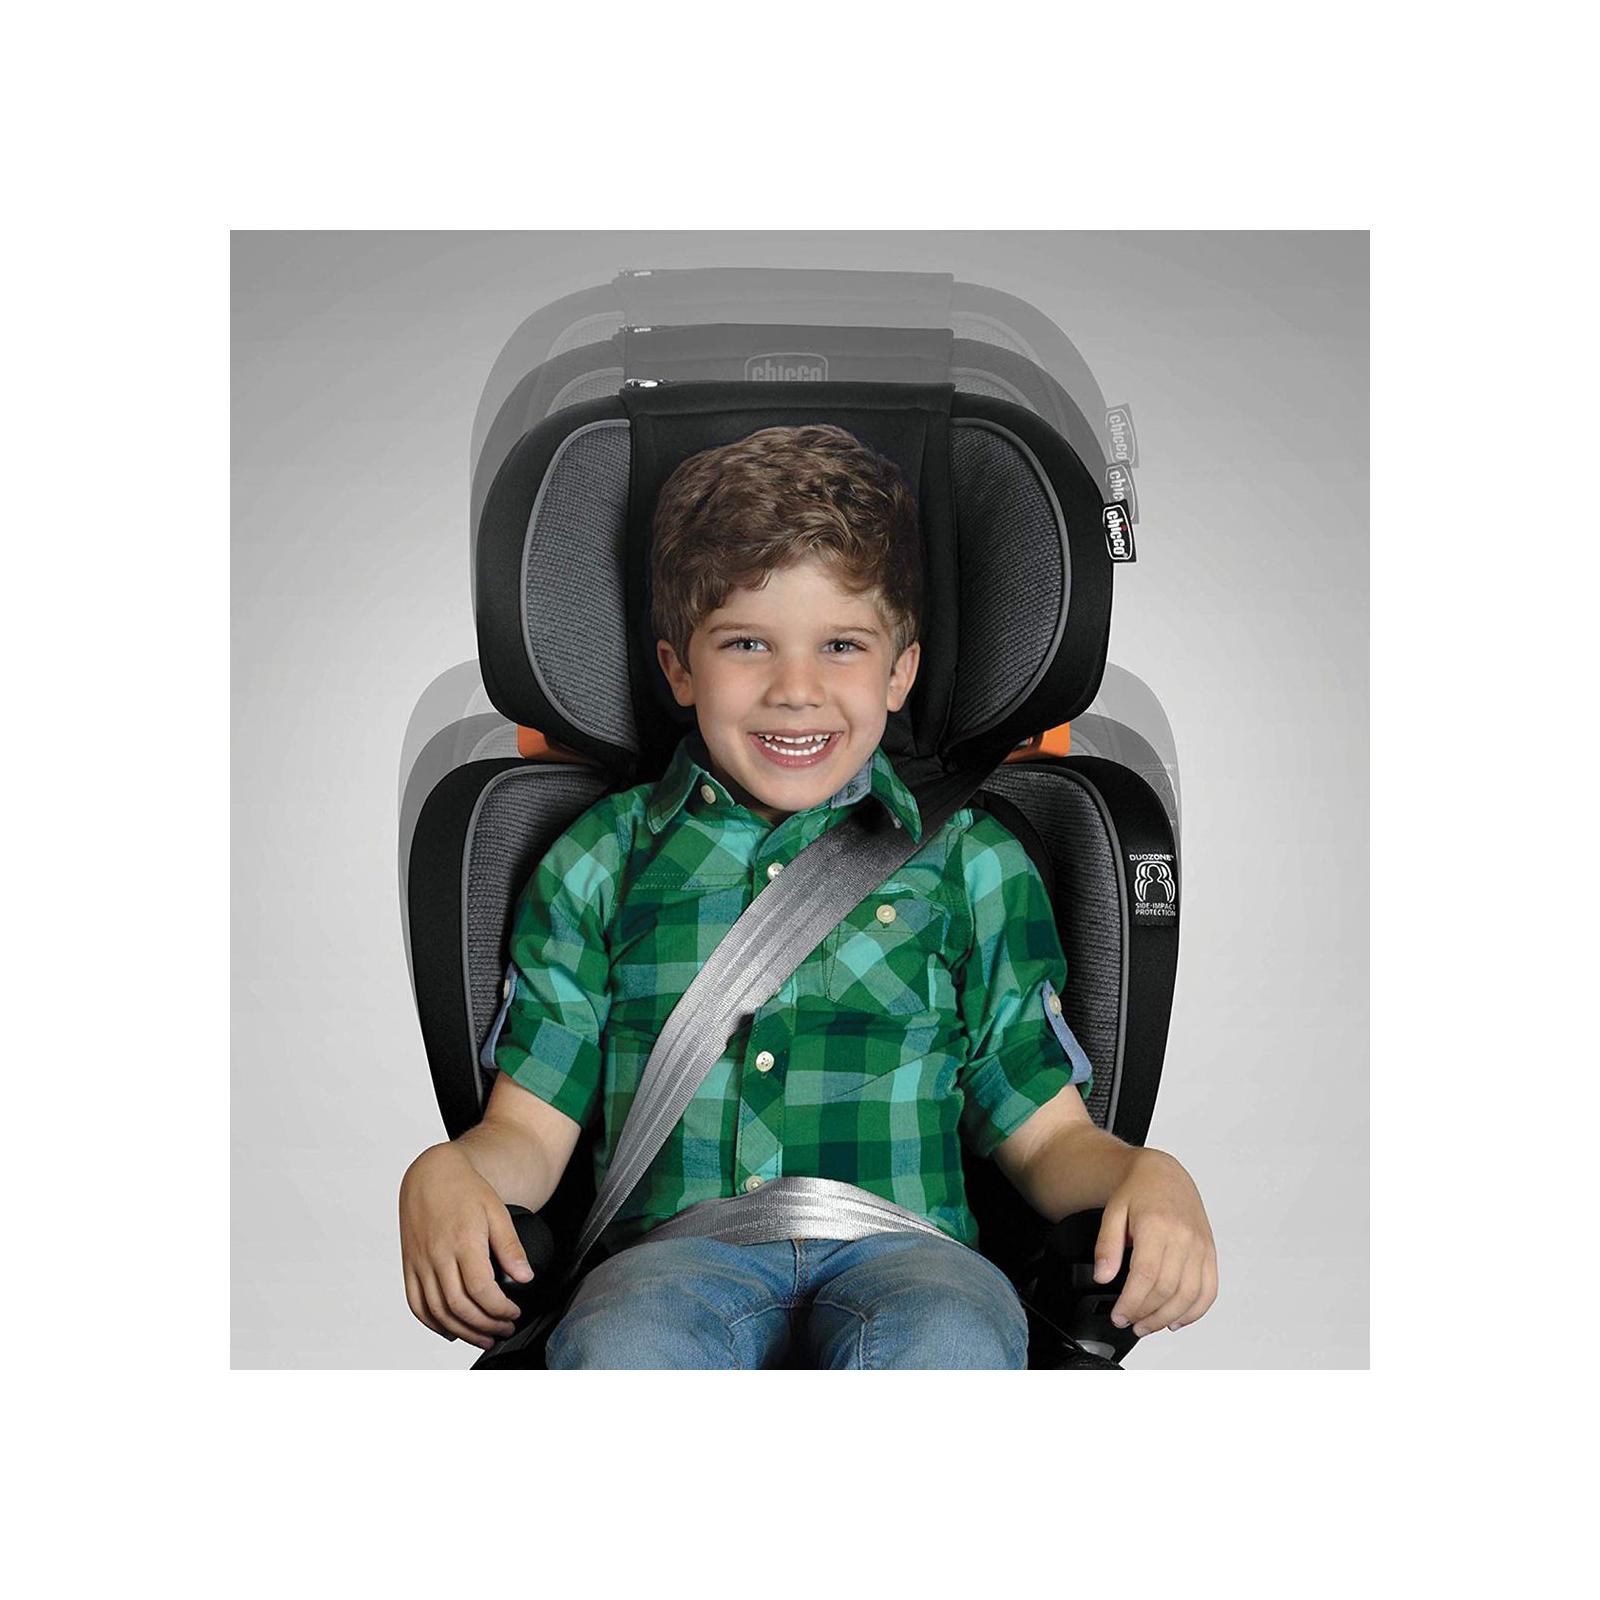 Автокресло Chicco Kid Fit Zip Air группа 2/3 (79486.19) изображение 7